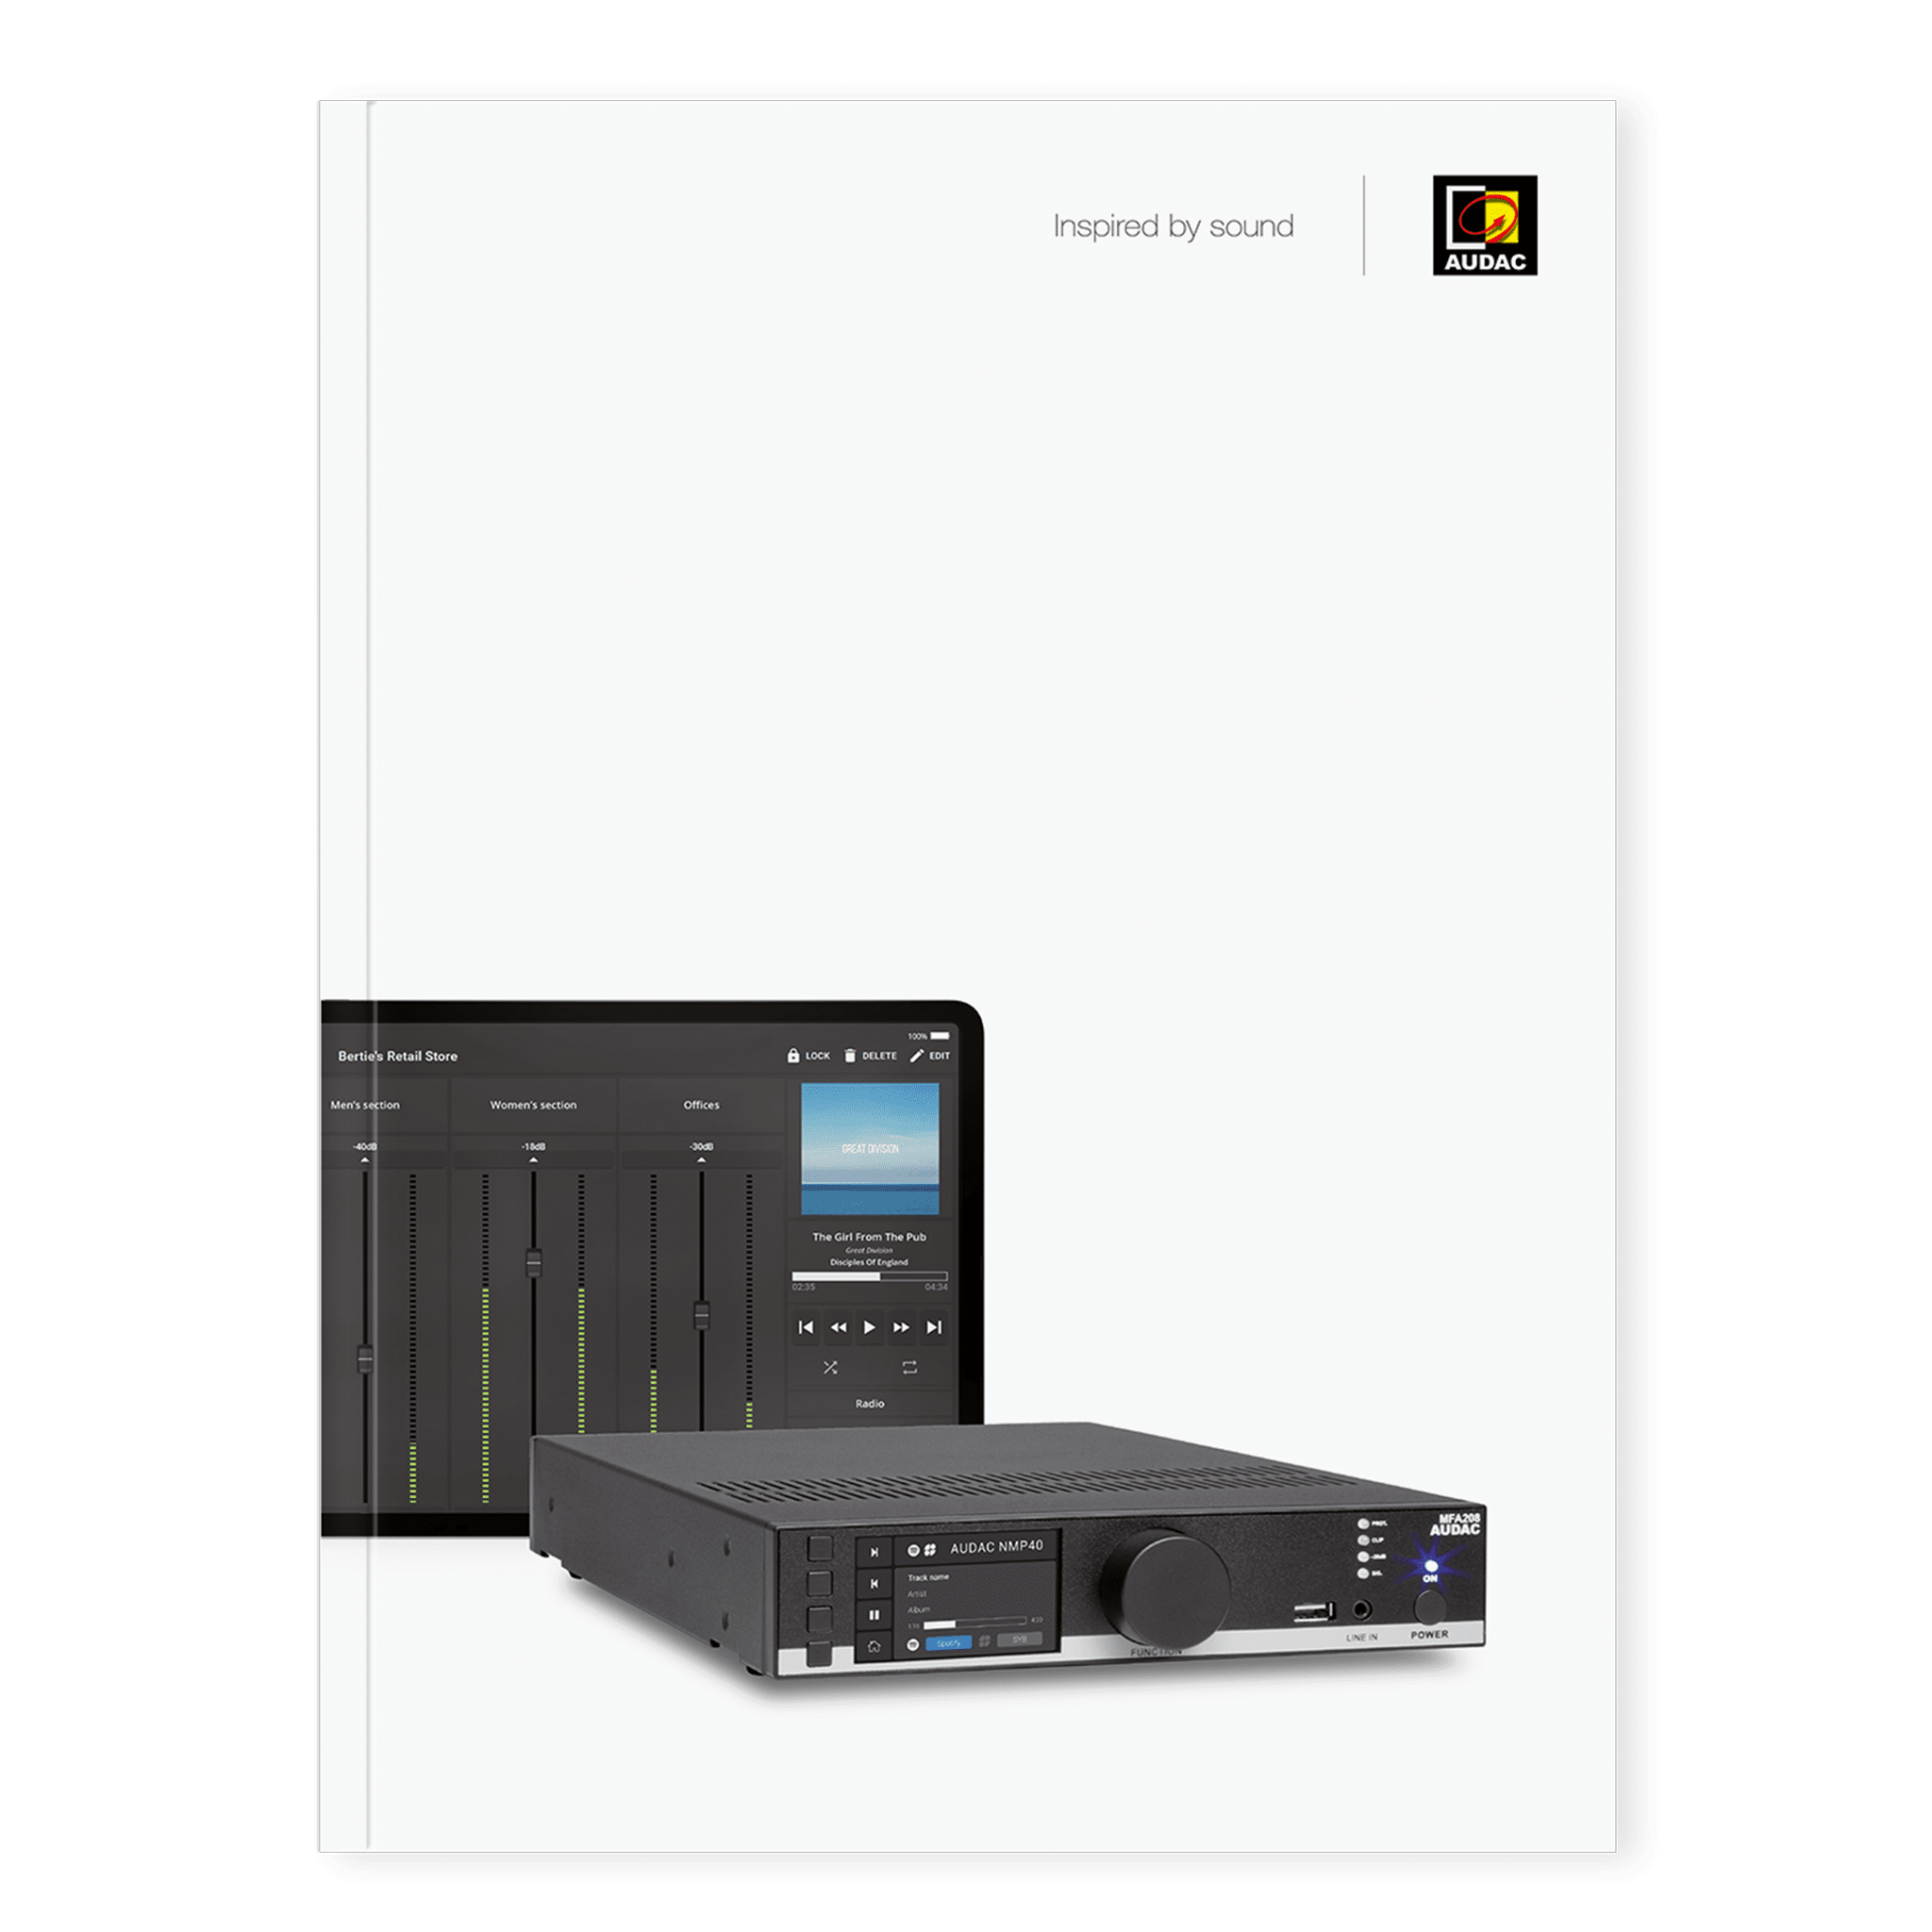 PROMO5215-ENG - AUDAC Catalogue V1.5